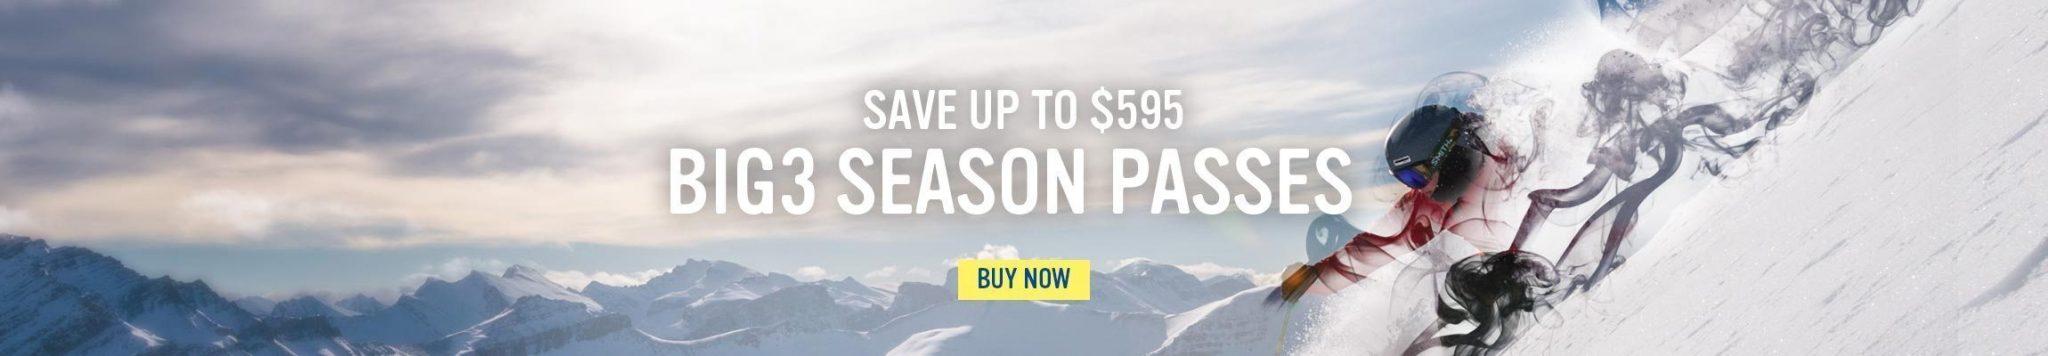 Big3 Season Passes